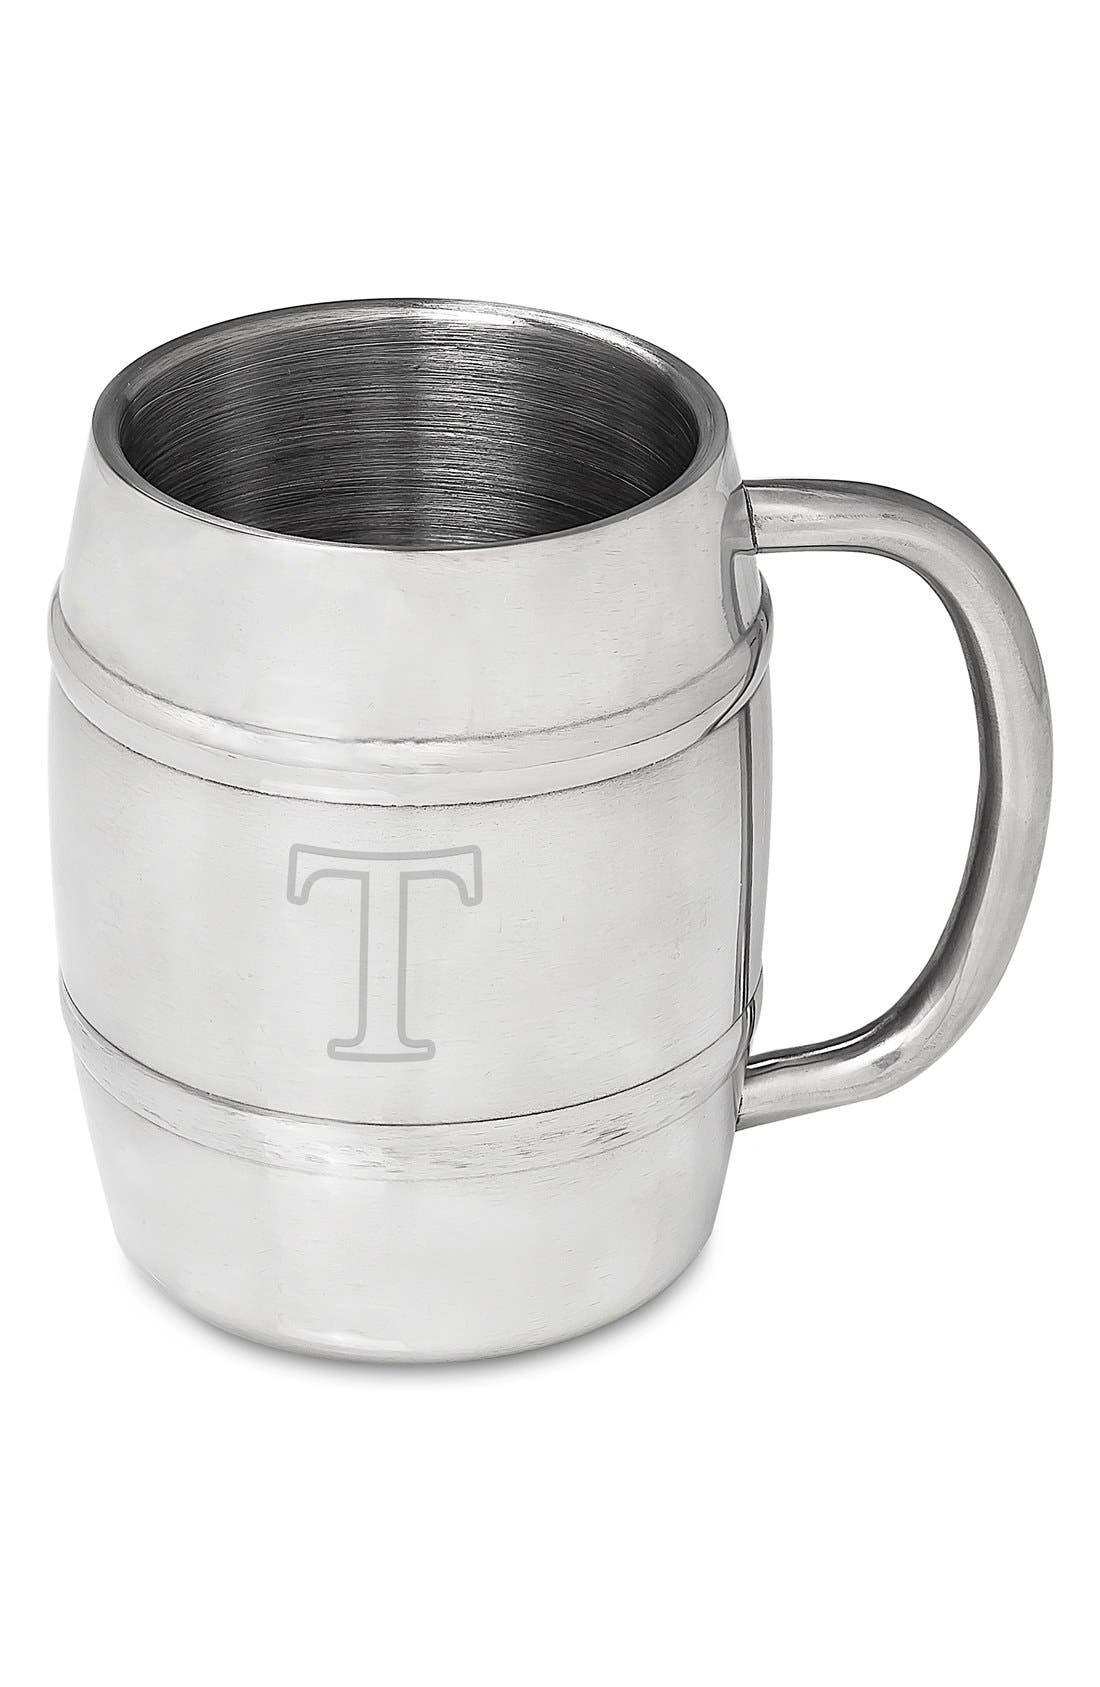 Cathy's Concepts Monogram Stainless Steel Keg Mug